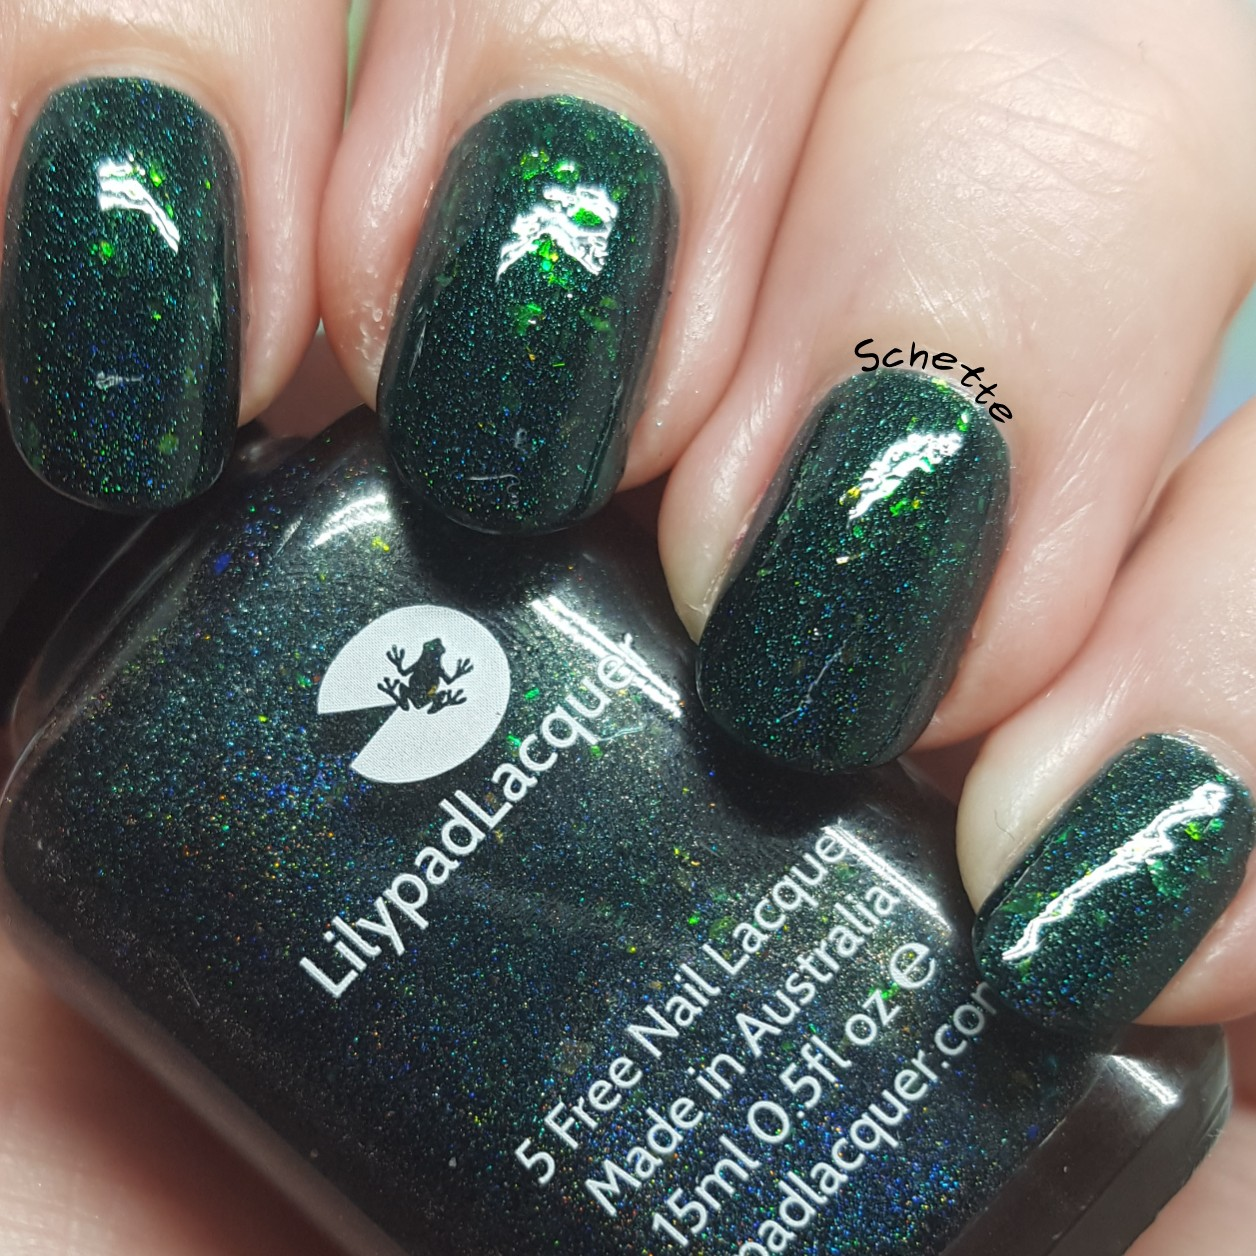 Lilypad Lacquer - Deep Green Sea